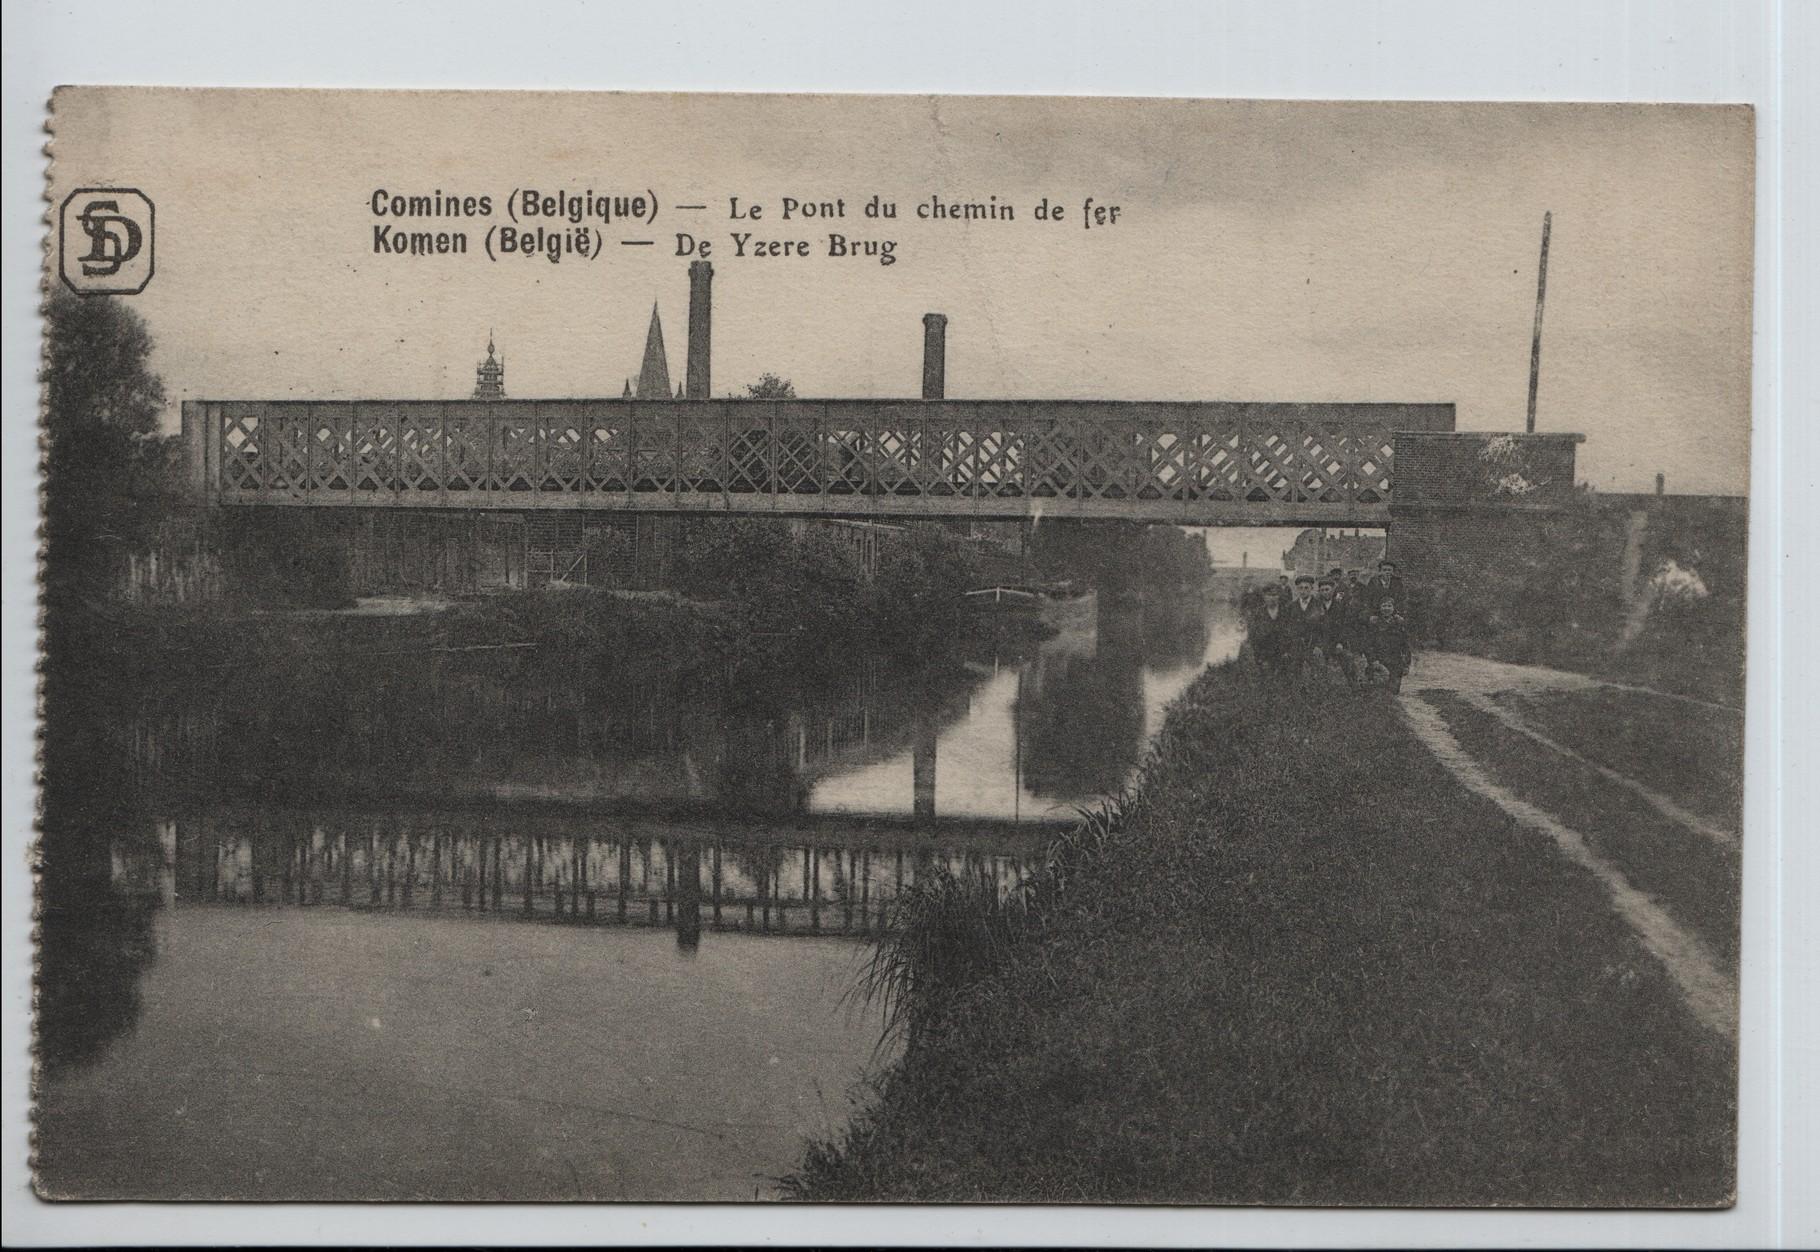 8. Railway bridge at Comines